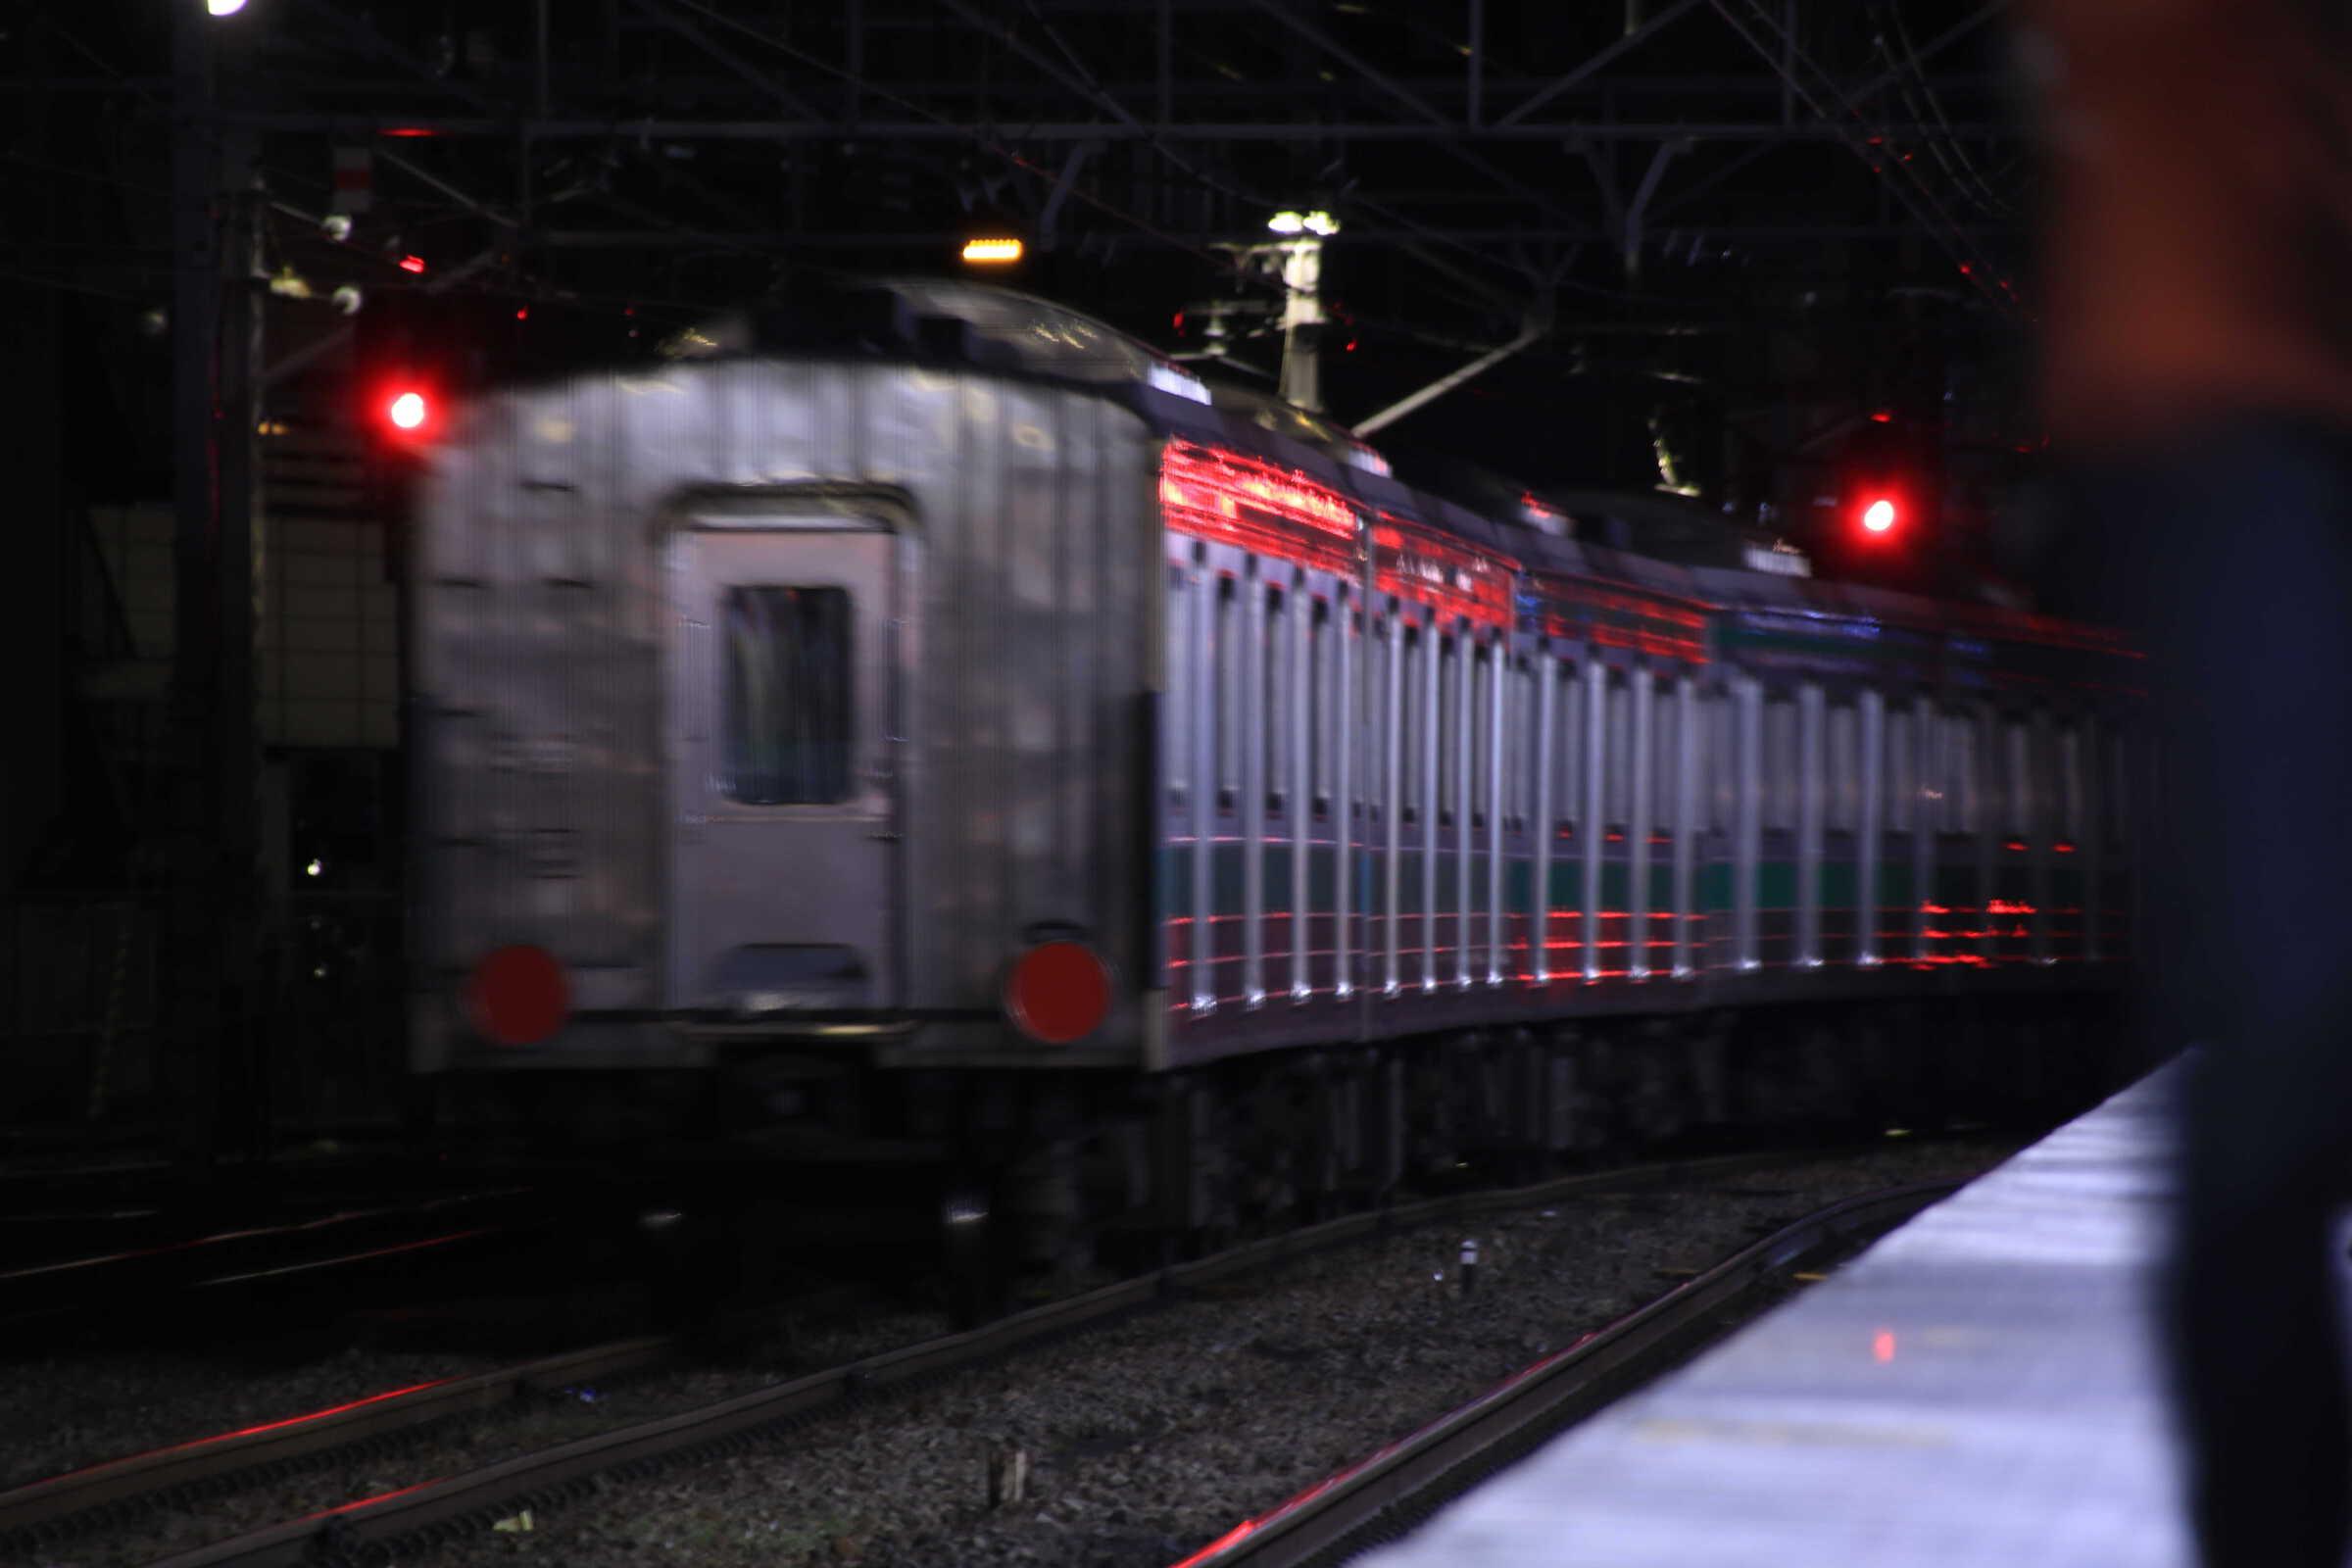 配9433列車 205系 宮ハエ28編成 廃車の為のNN入場配給 EF64-1031+205系 宮ハエ28編成中間車6両(7〜2号車)